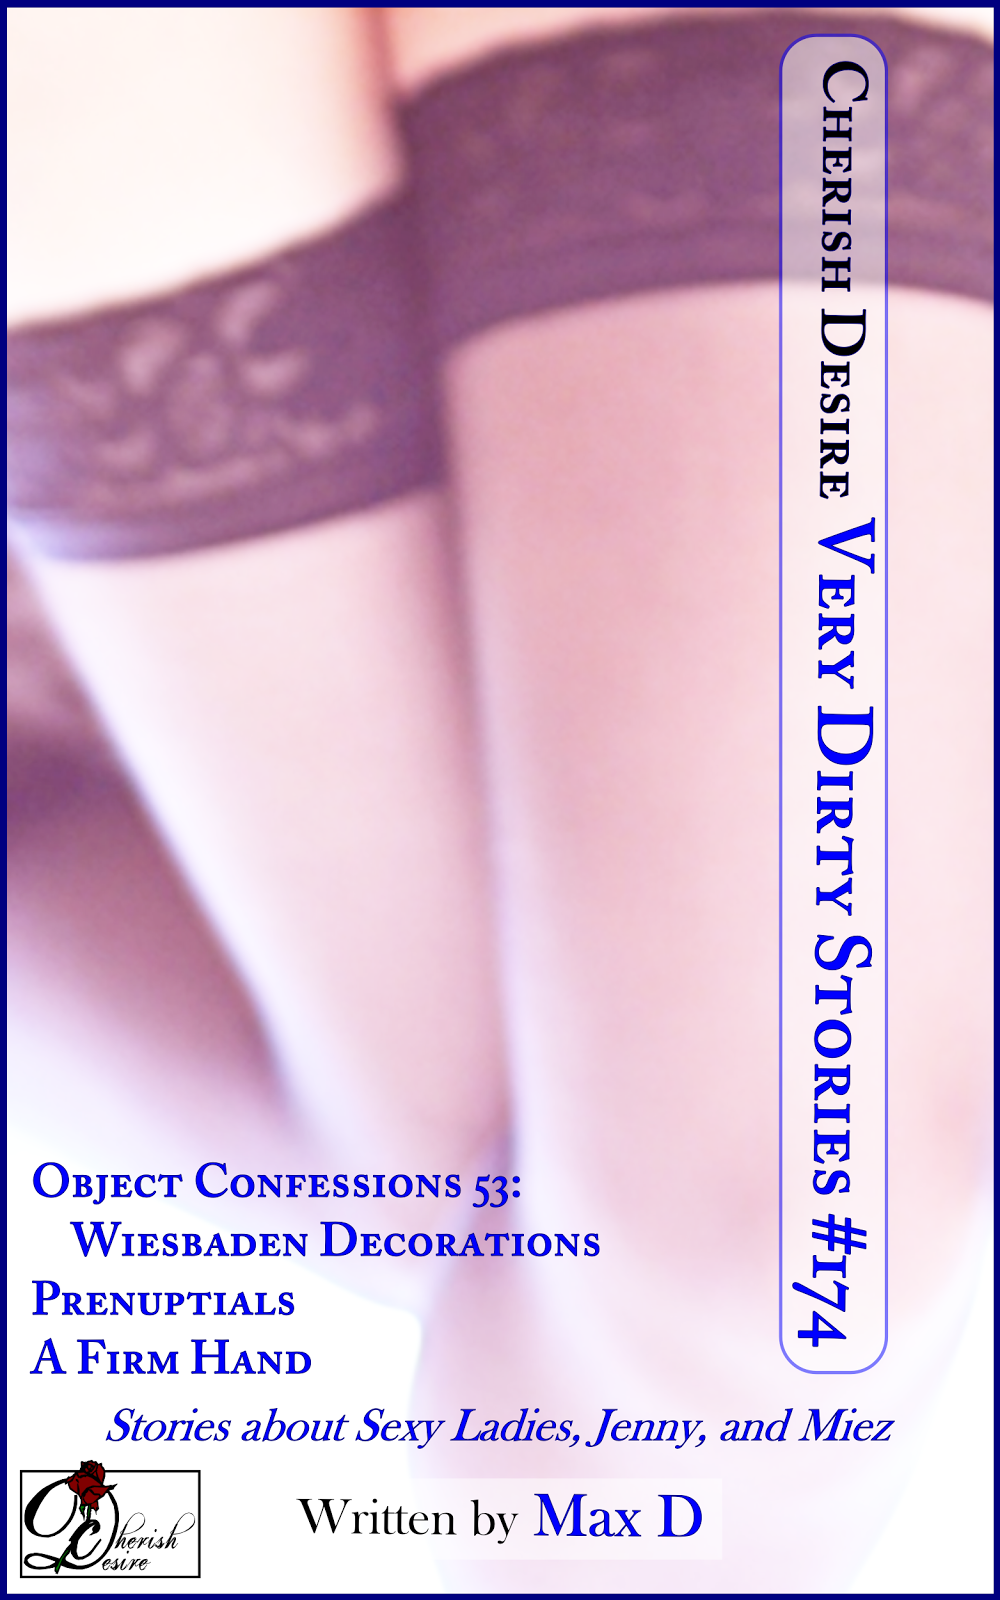 Cherish Desire: Very Dirty Stories #174, Max D, erotica